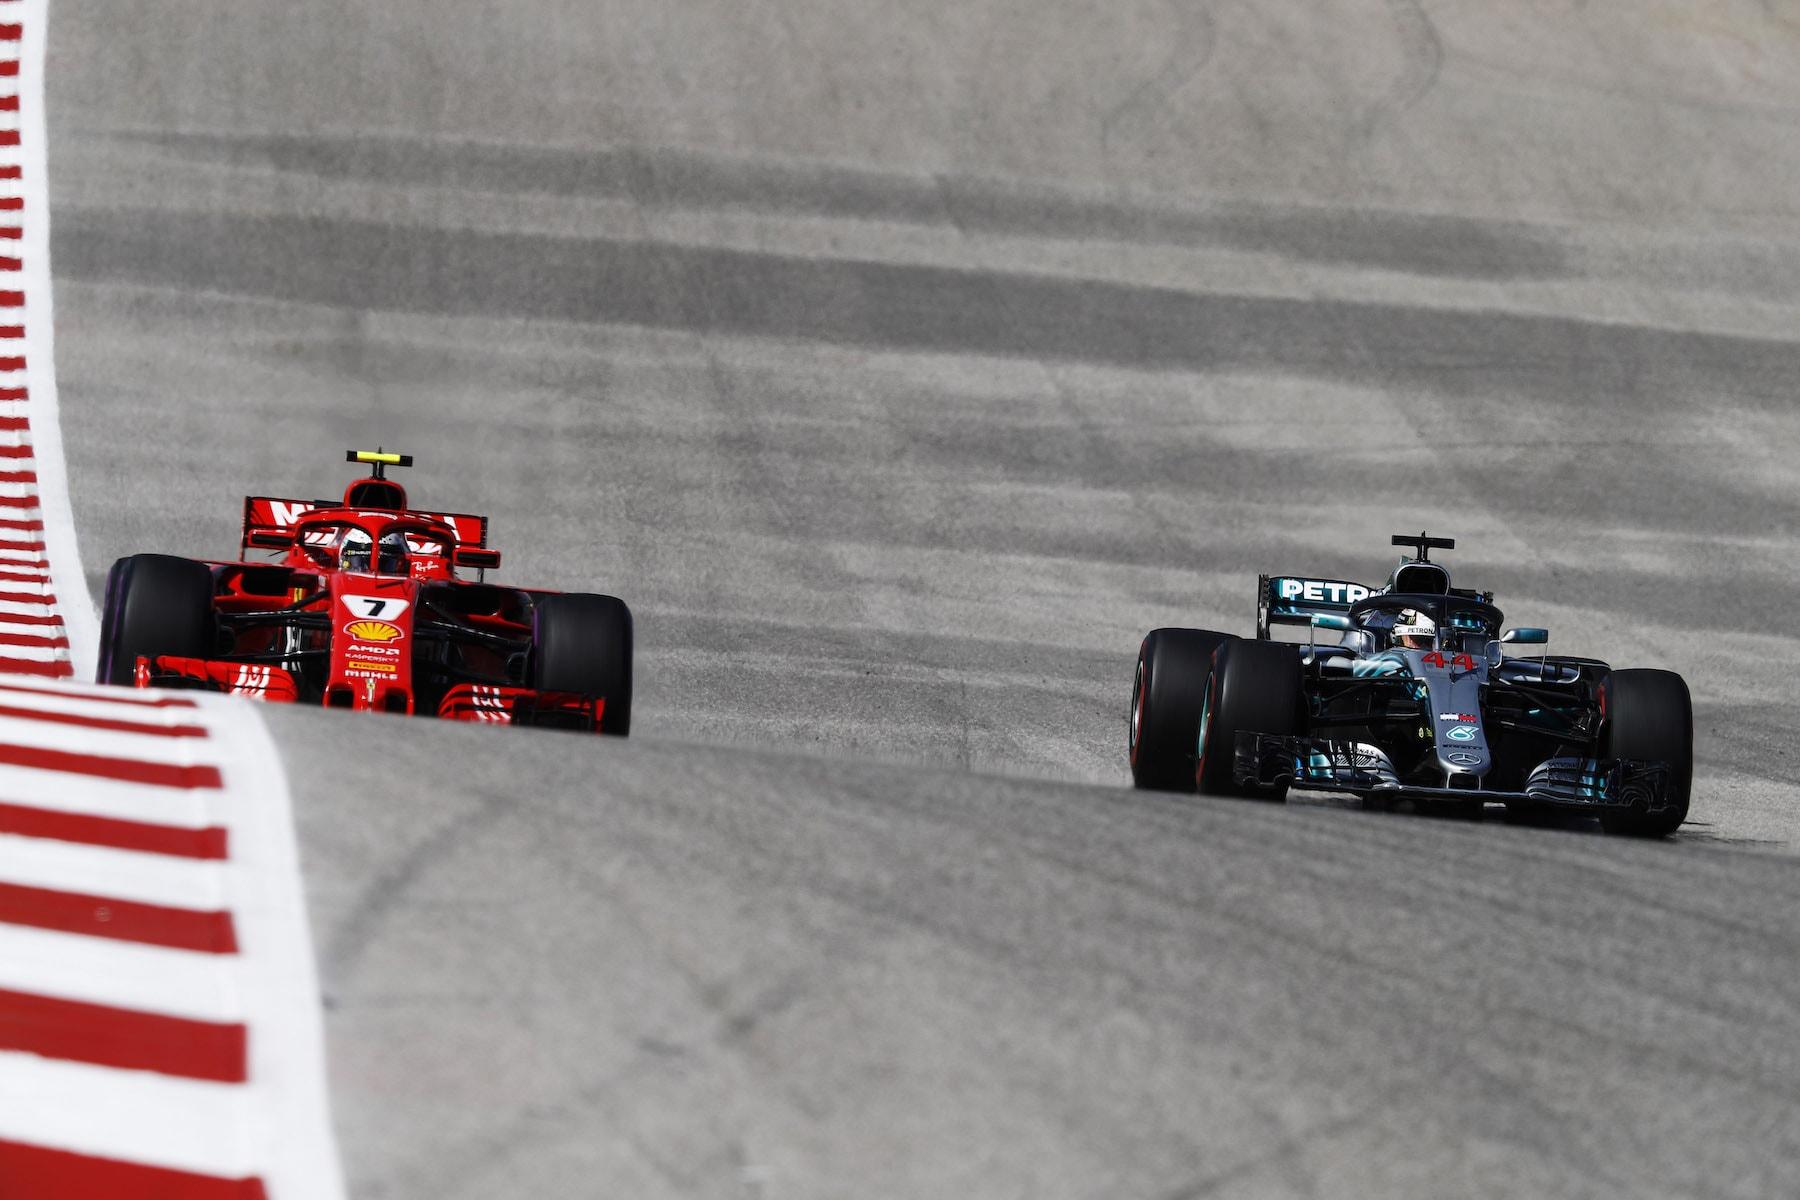 F 2018 Lewis Hamilton | Mercedes W09 | 2018 USGP P3 1 copy.jpg